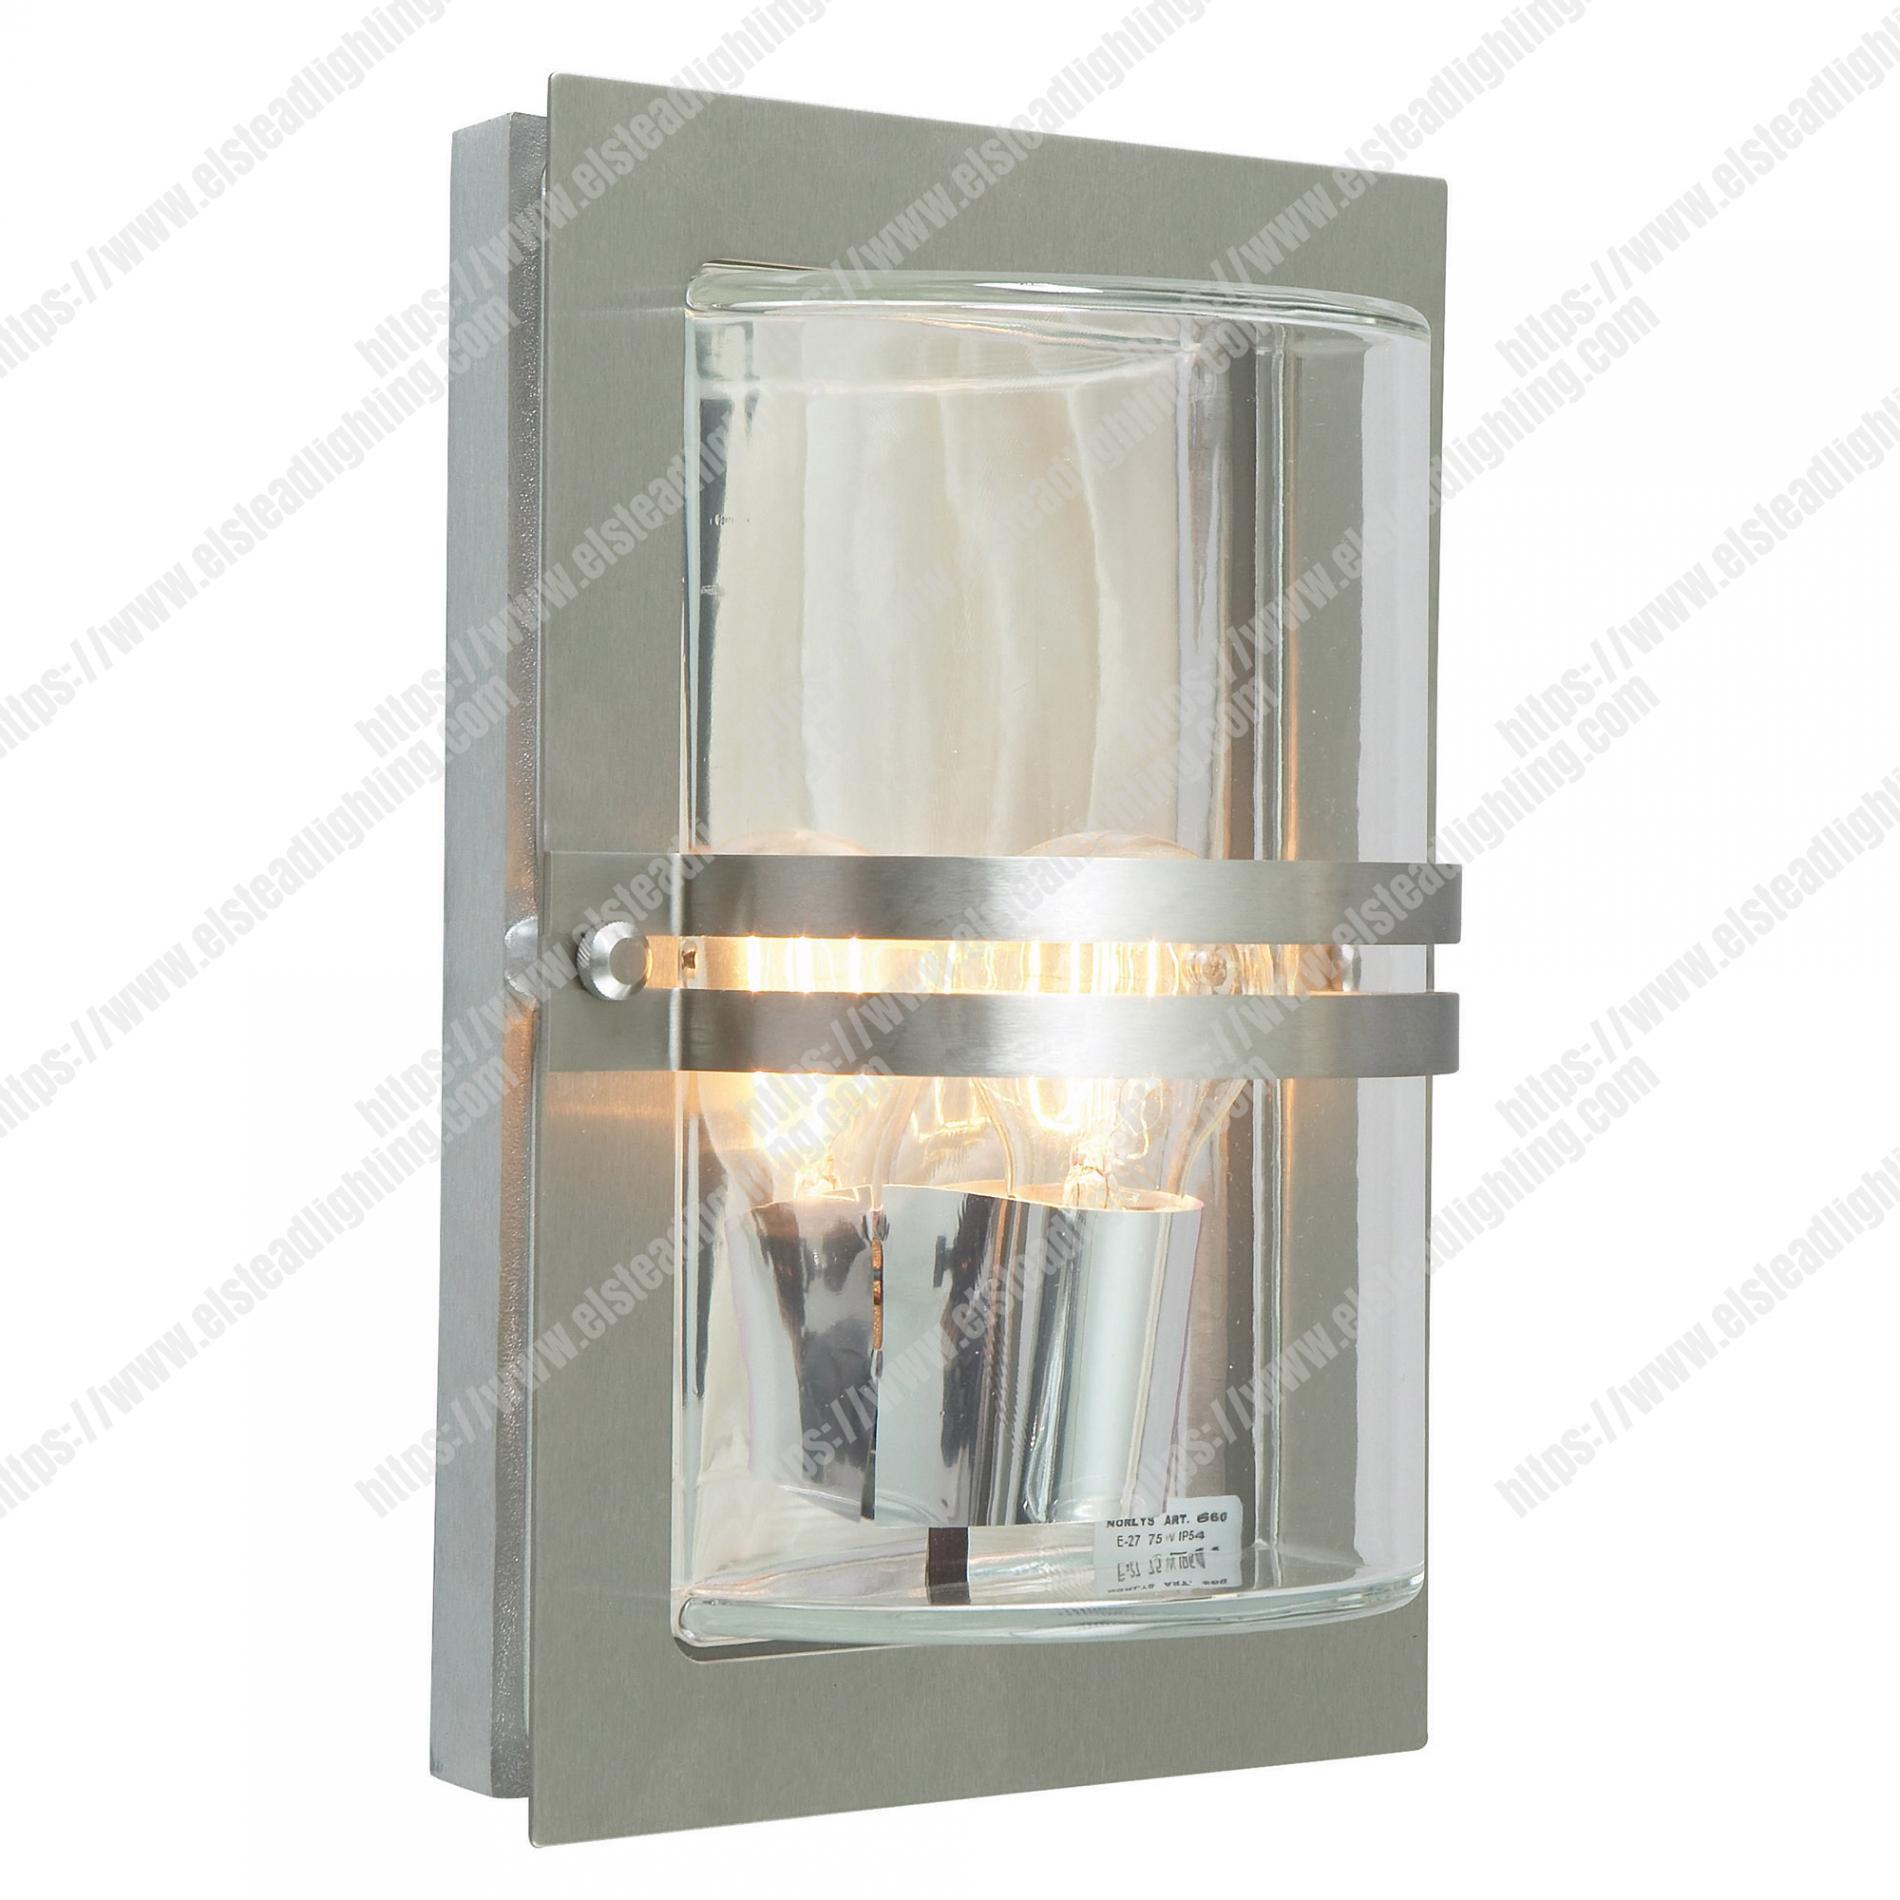 Light Wall Lantern Stainless Steel